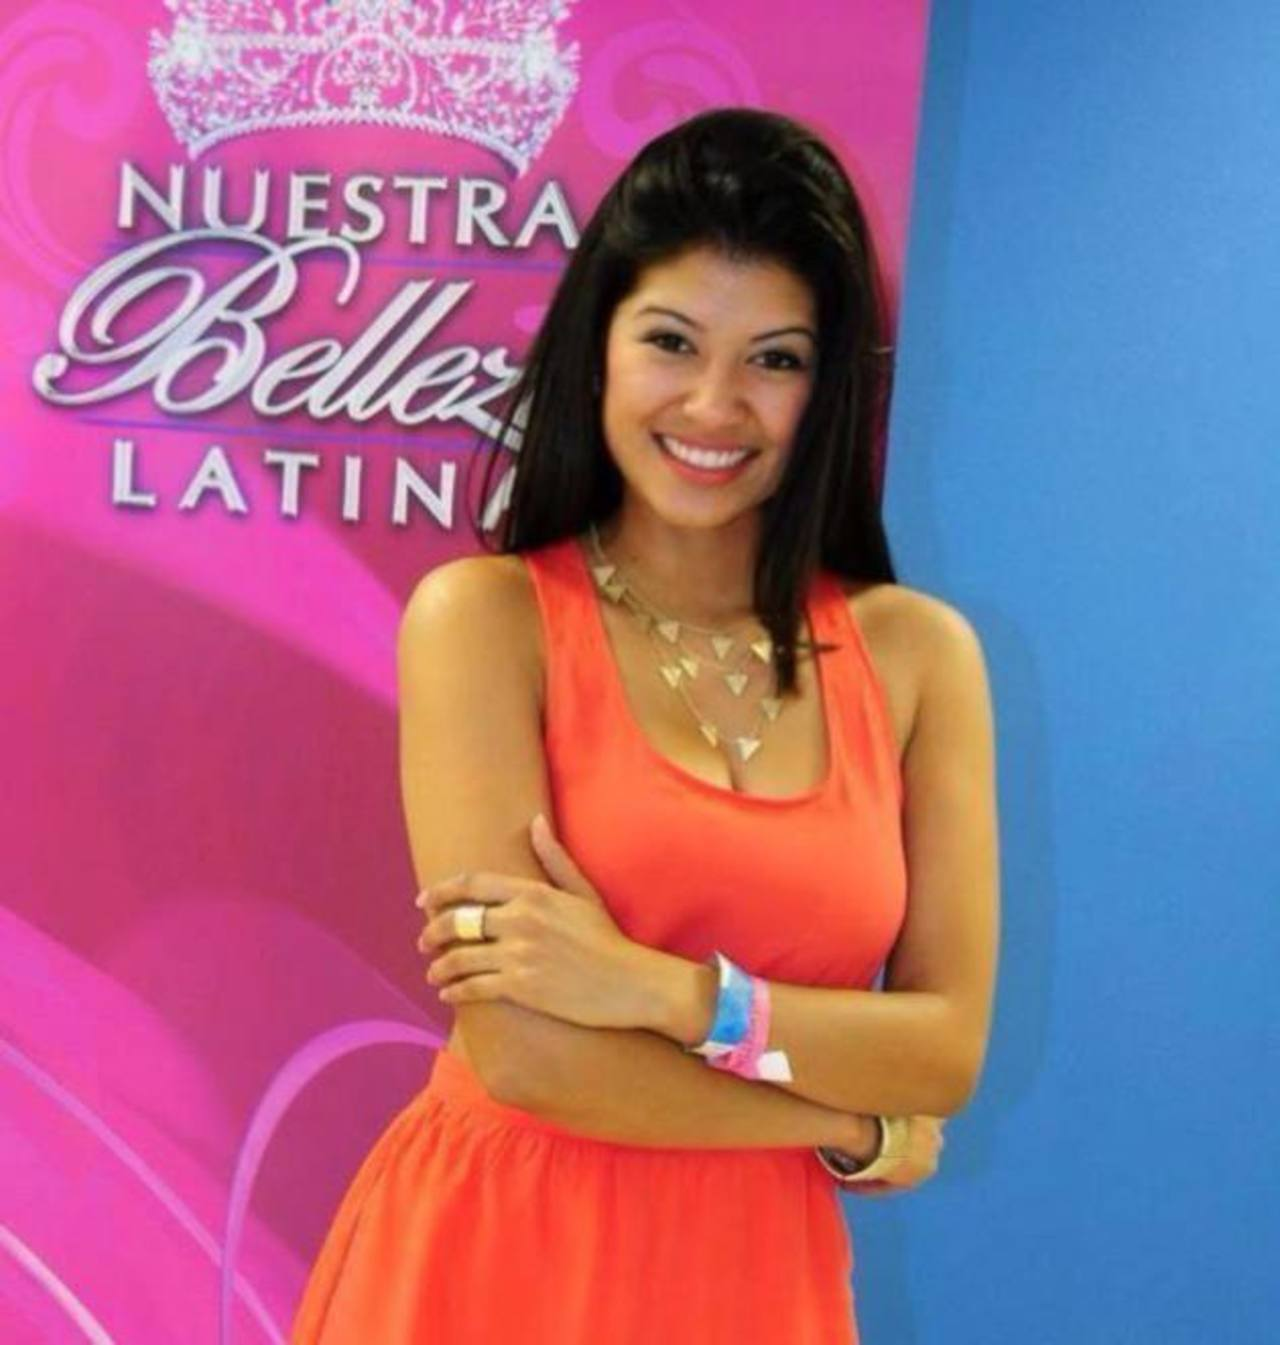 Karina Hermosillo primera lesbiana en Nuestra Belleza Latina